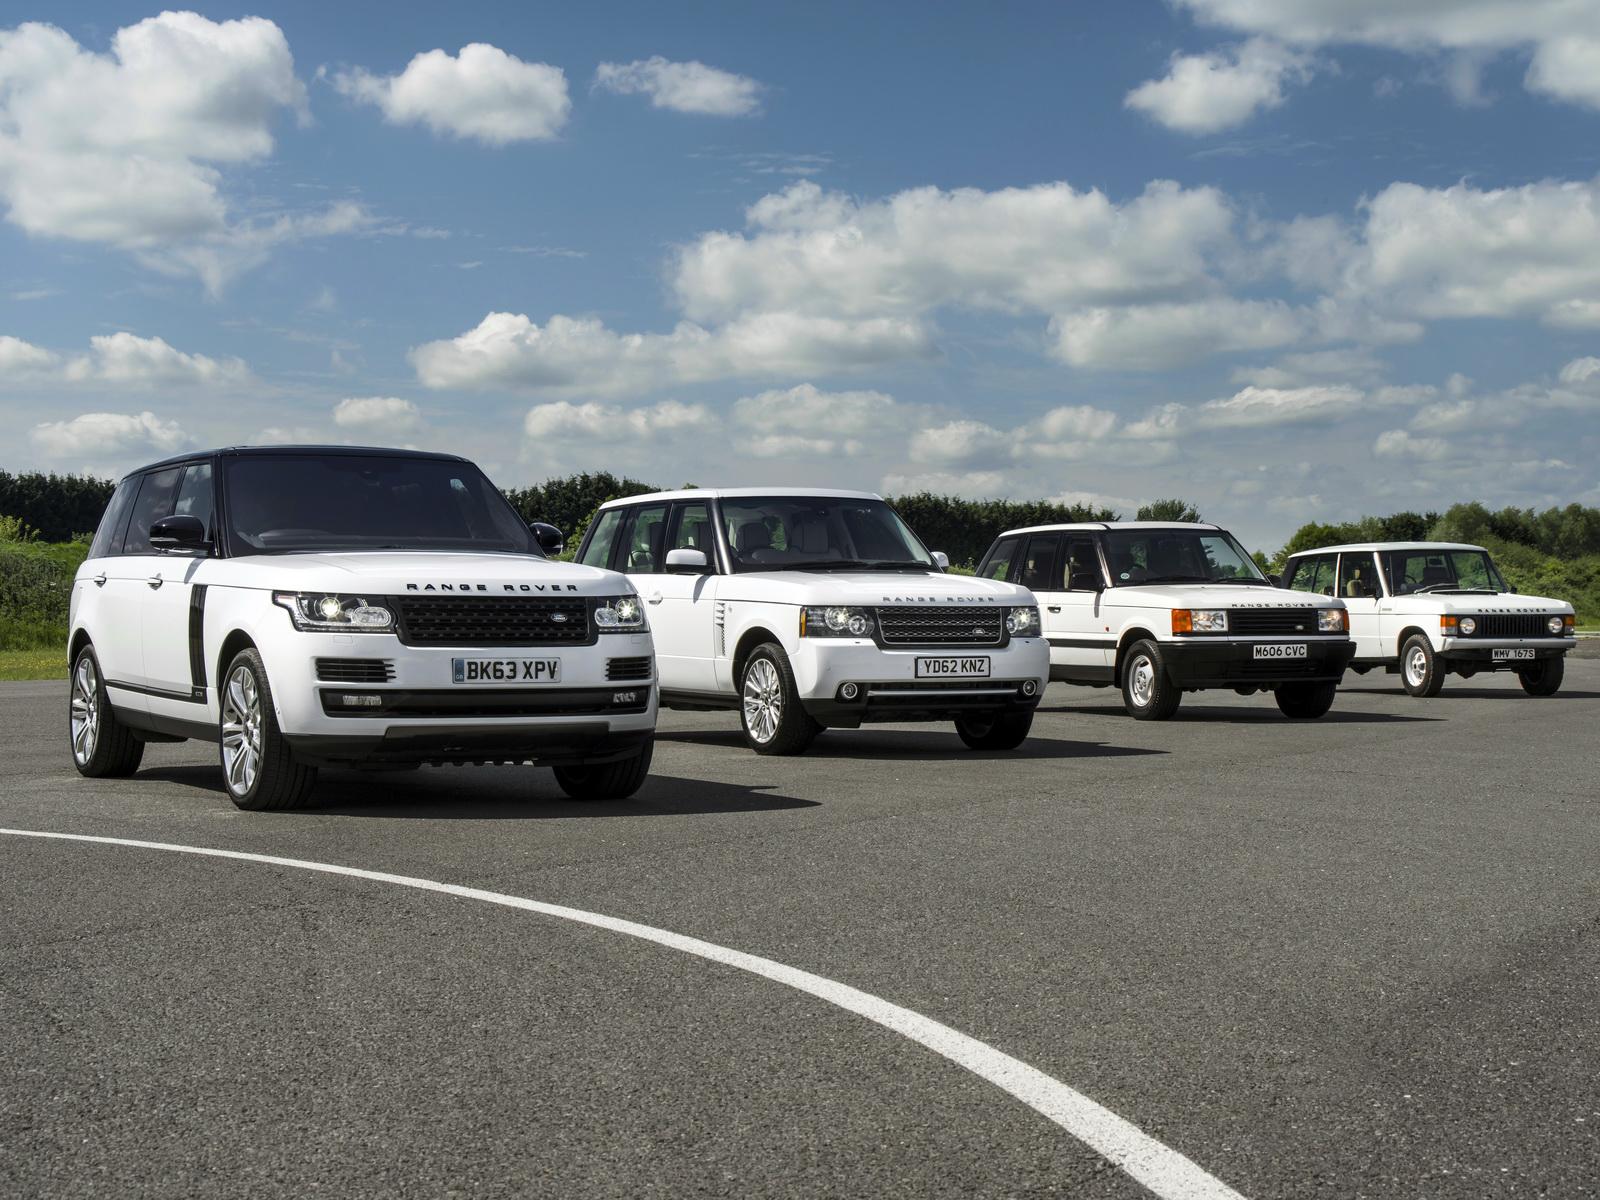 Range Rover Vogue Celebrates 45th Birthday With Ancestors